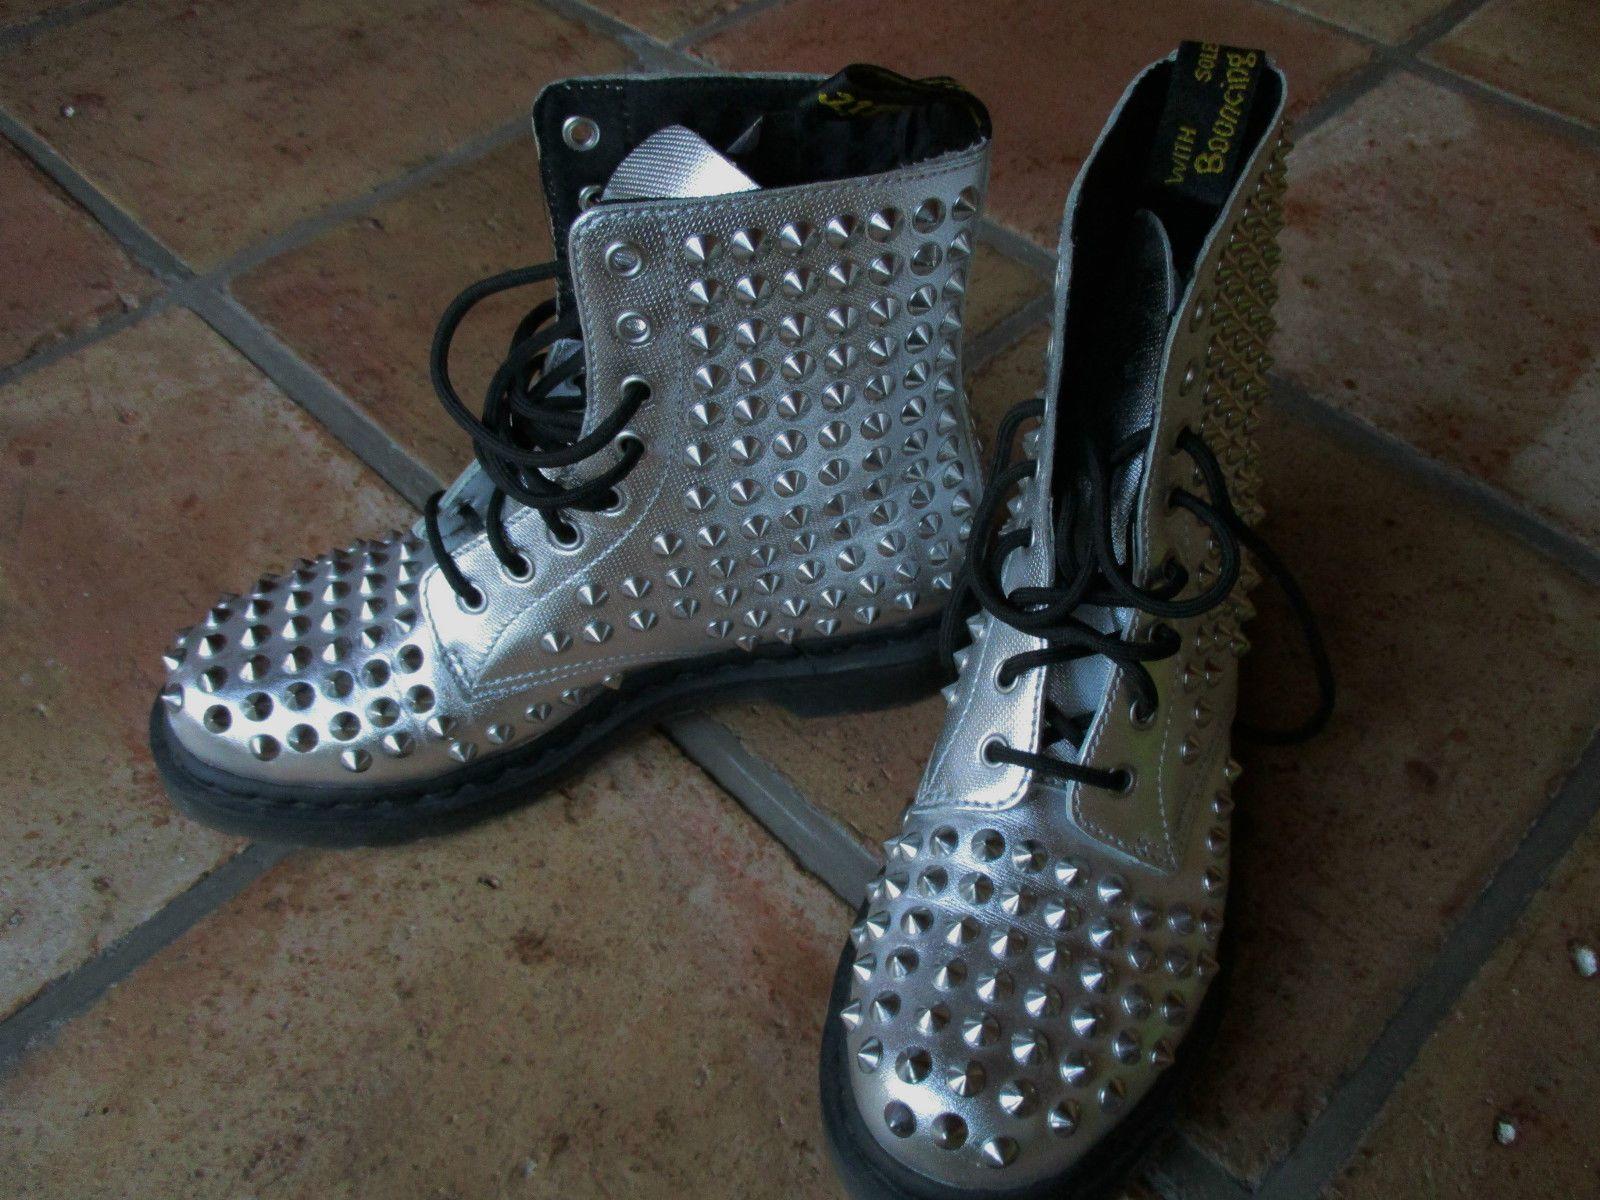 ADIDAS ORIGINALS STIEFEL Damen Boots Gr. UK 7.5 (DE 41) kein